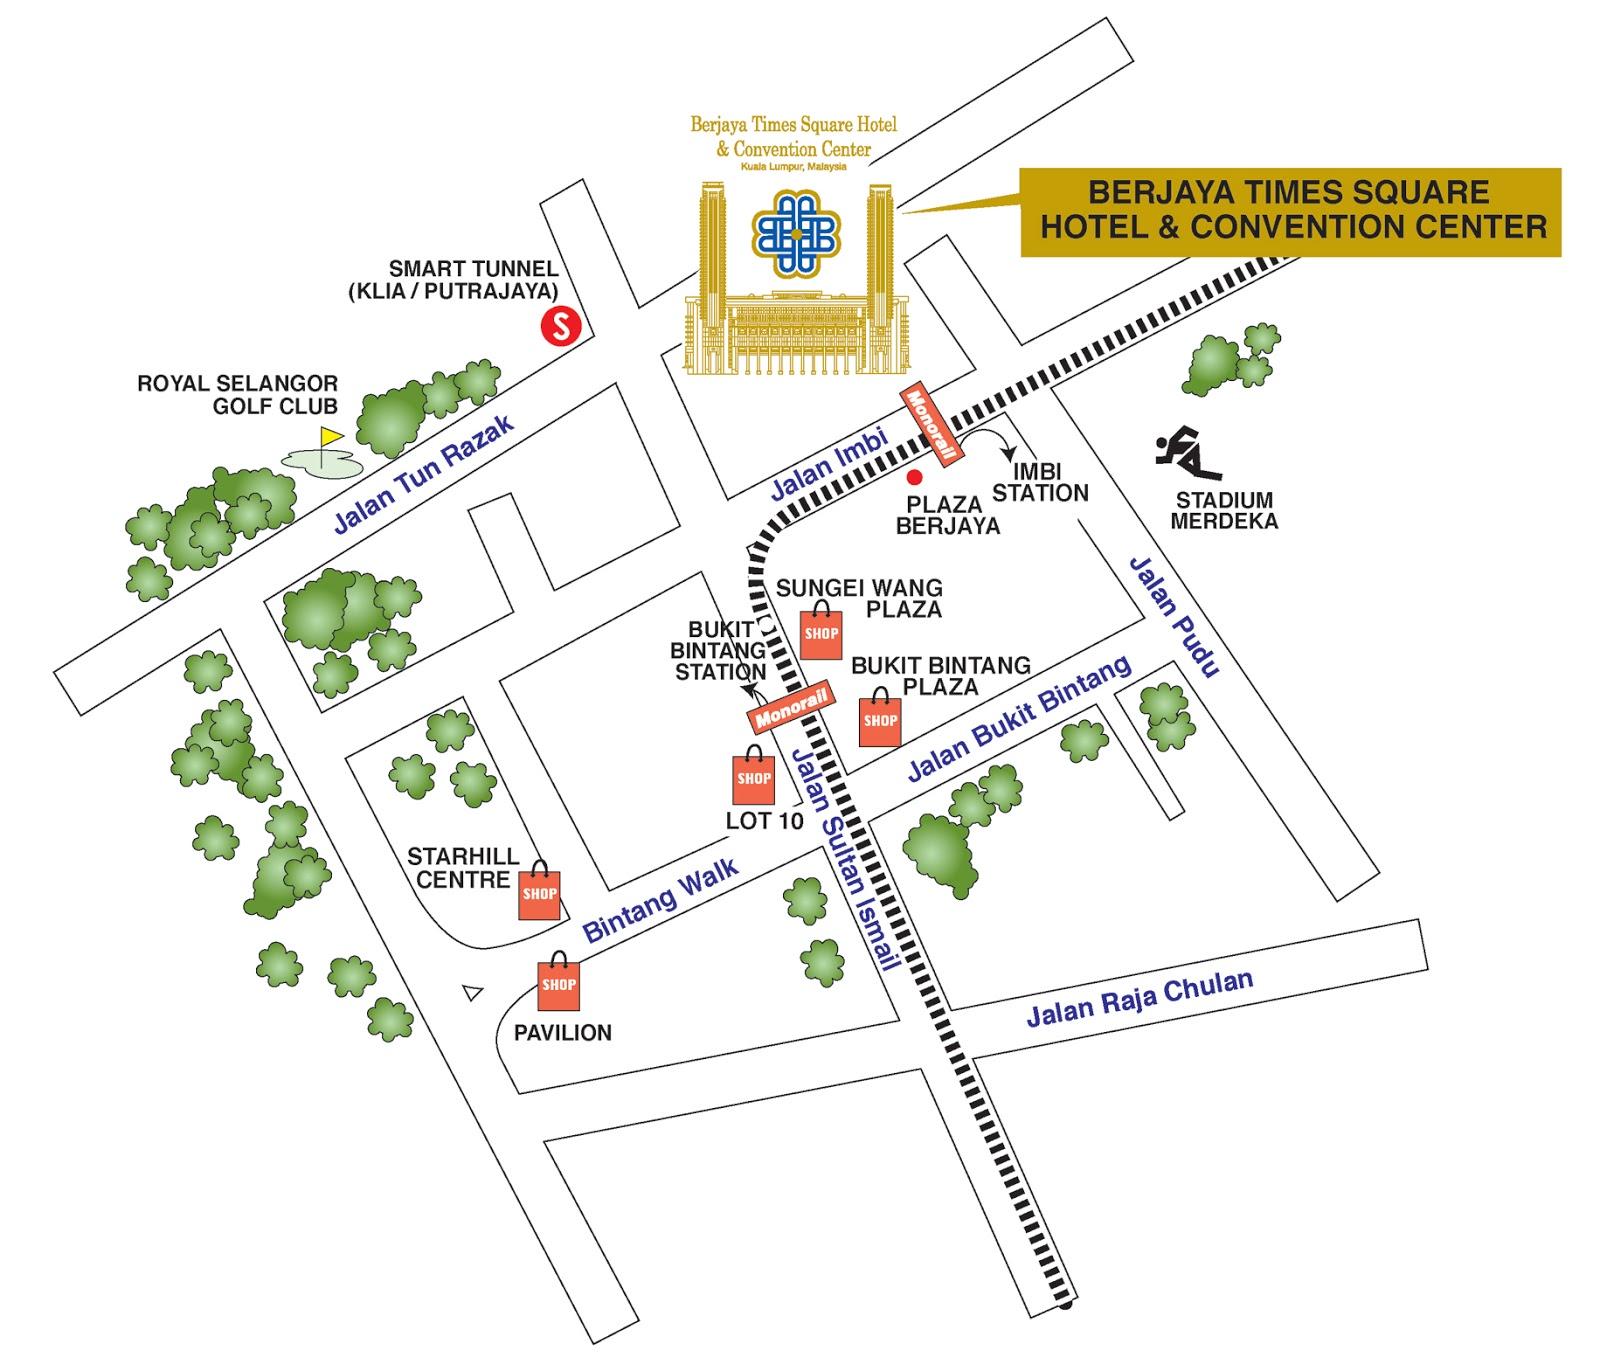 berjaya times square hotel kl - map